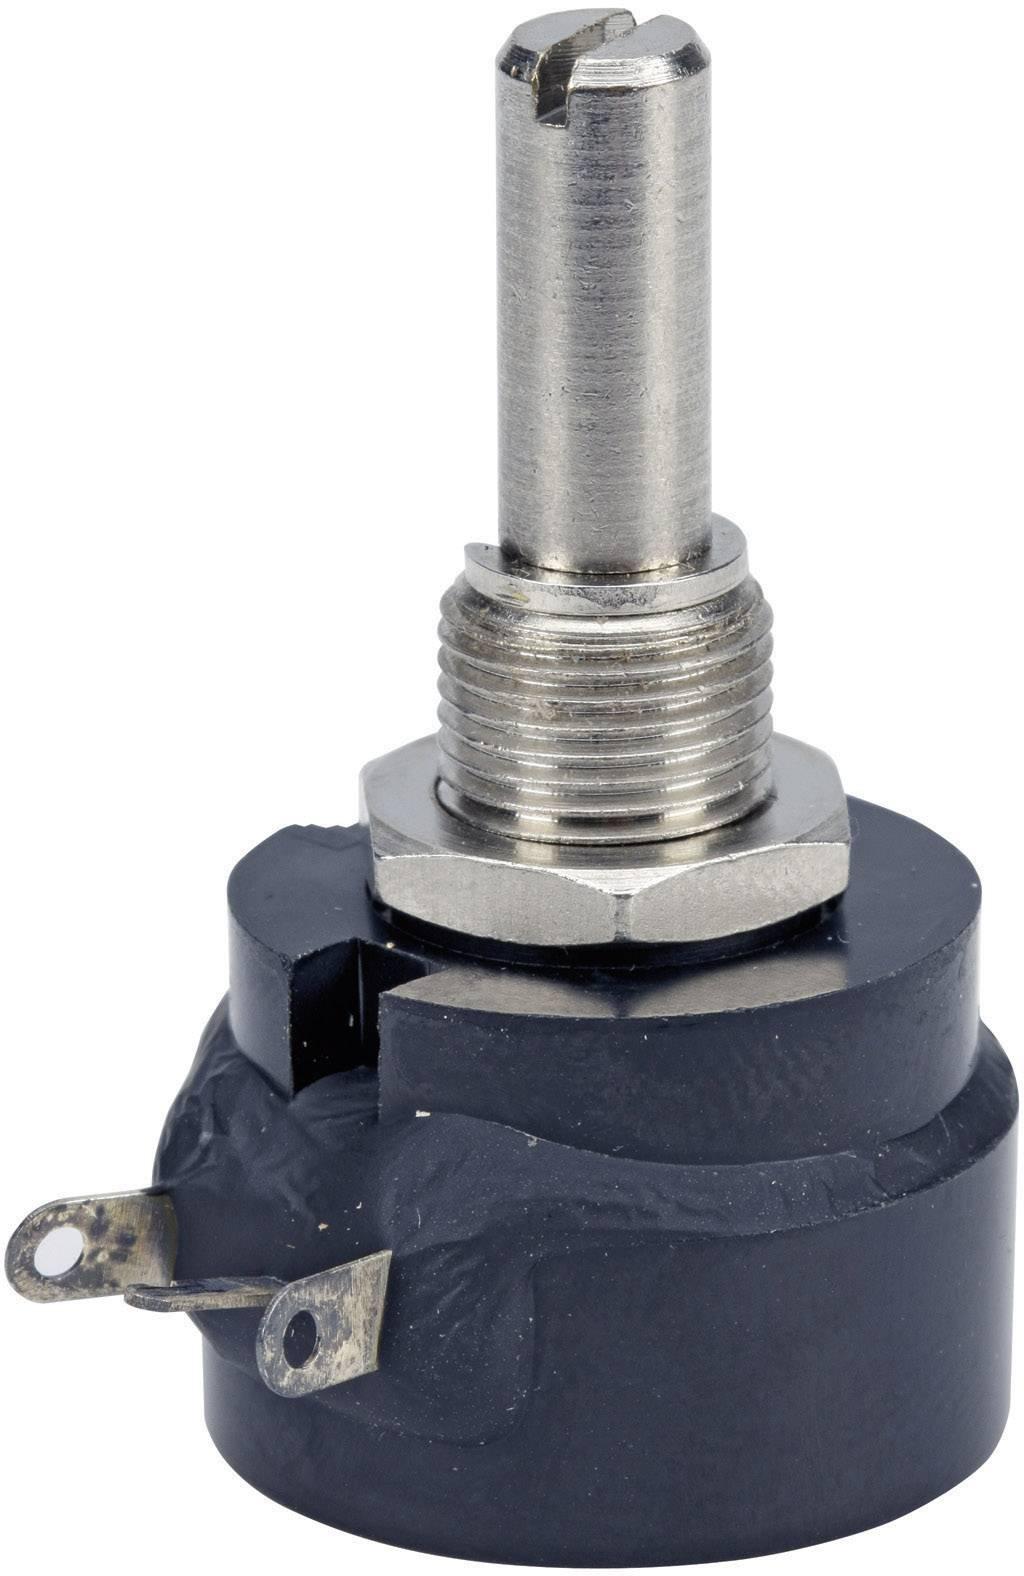 Drôtový potenciometer TT Electro, 3101206105, 50 Ω, 0.5 W, ± 10%